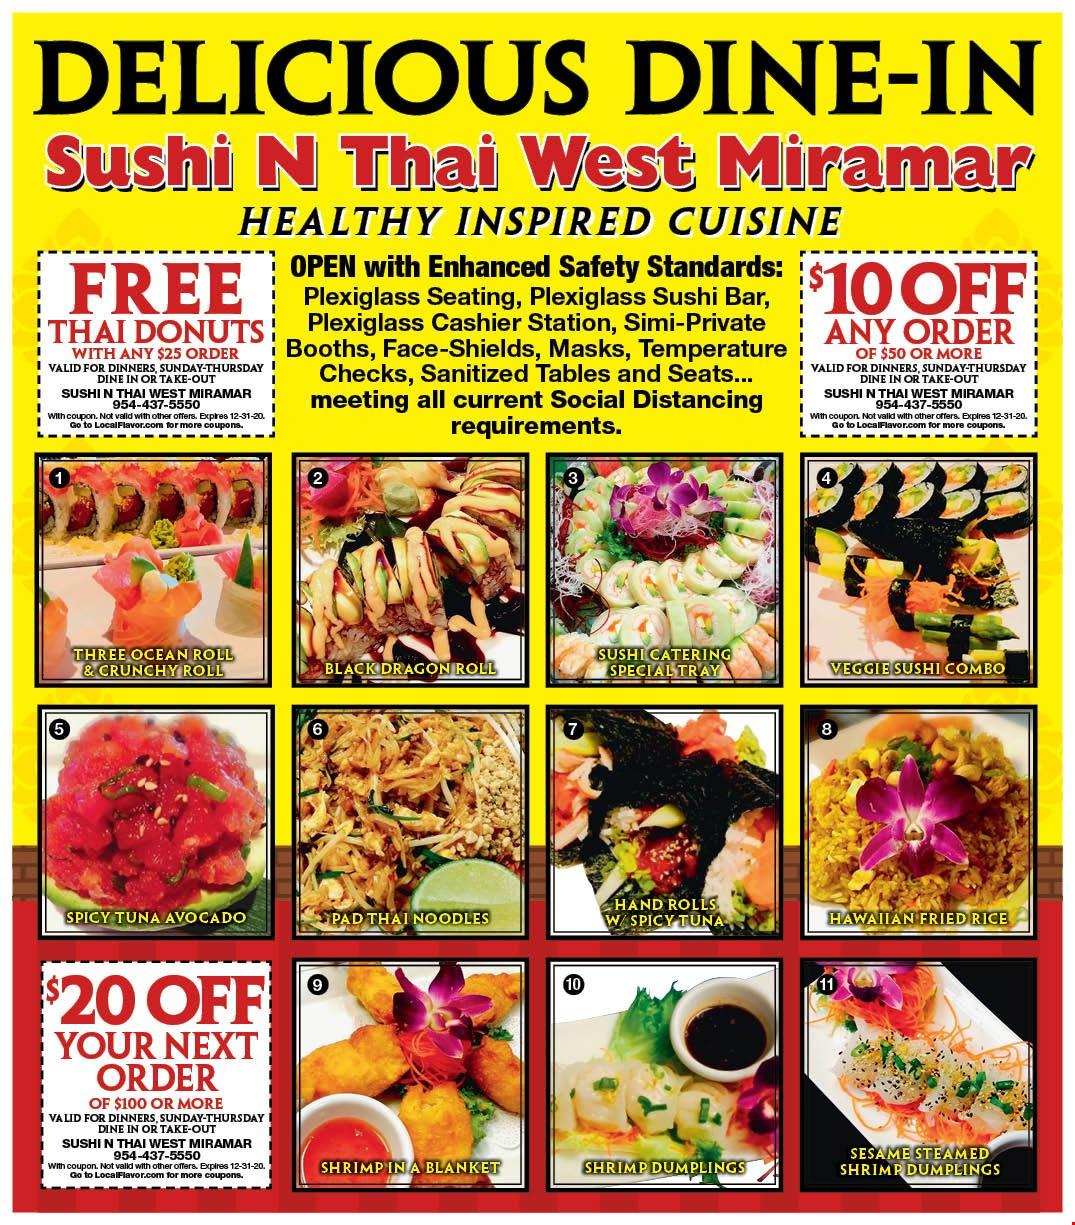 Sushi N Thai West Miramar Coupons Deals Miramar Fl The sushi god of tokyo. sushi n thai west miramar coupons